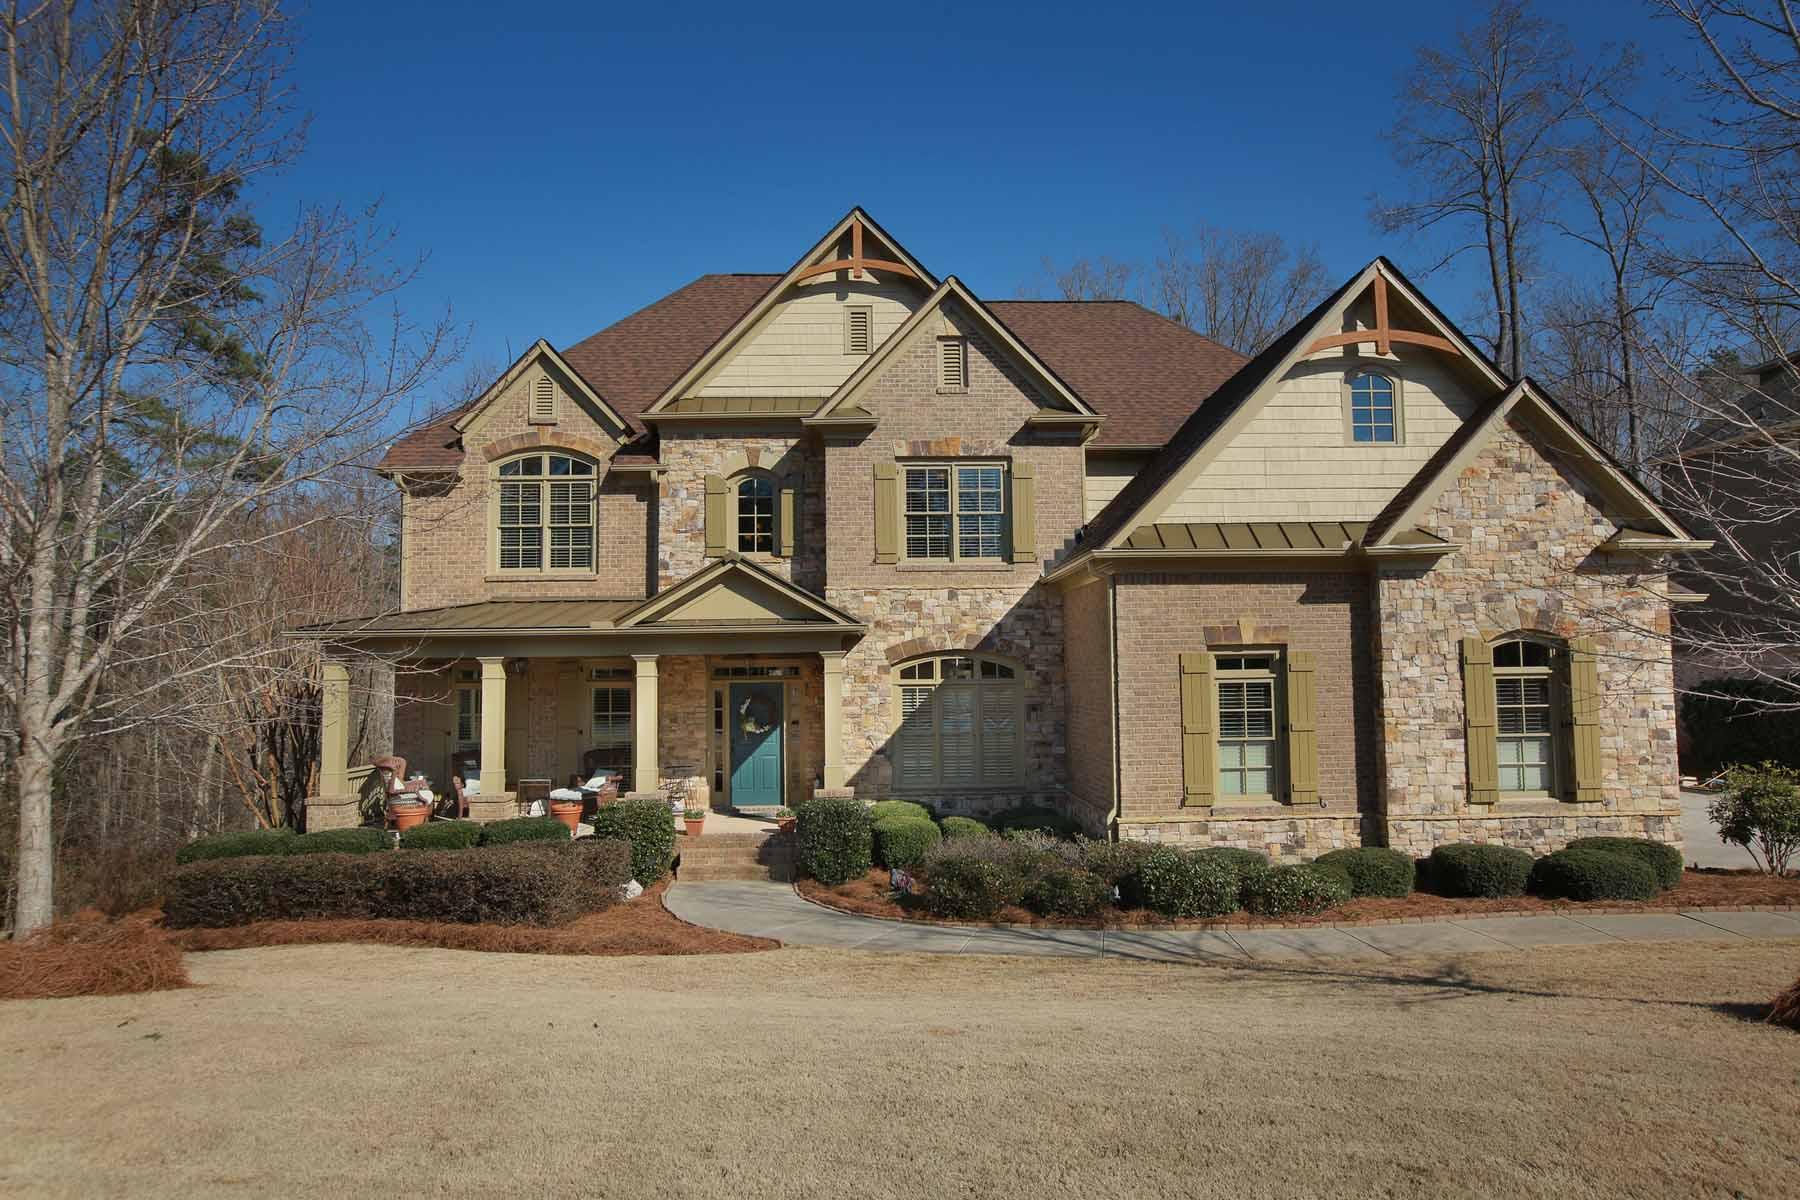 Casa Unifamiliar por un Venta en Luxurious Lake Living 6115 Windjammer Point Cumming, Georgia, 30041 Estados Unidos